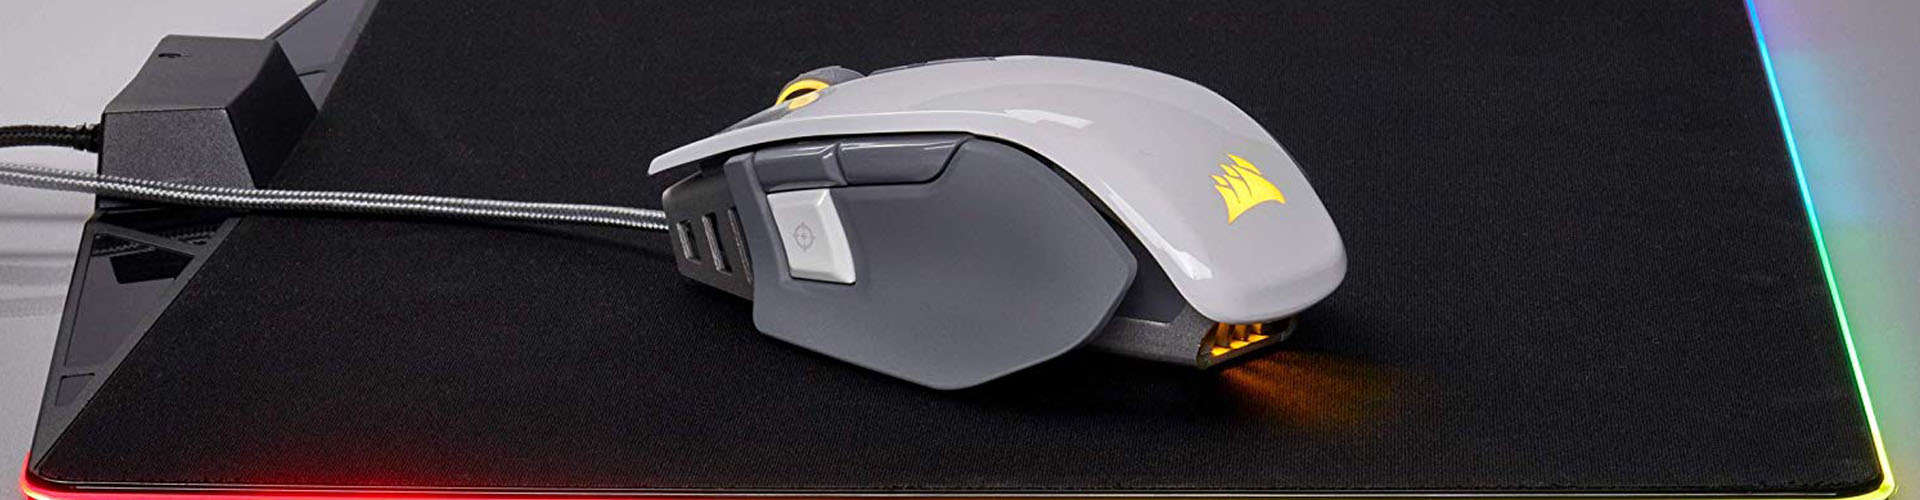 Corsair M65 RGB Elite Review